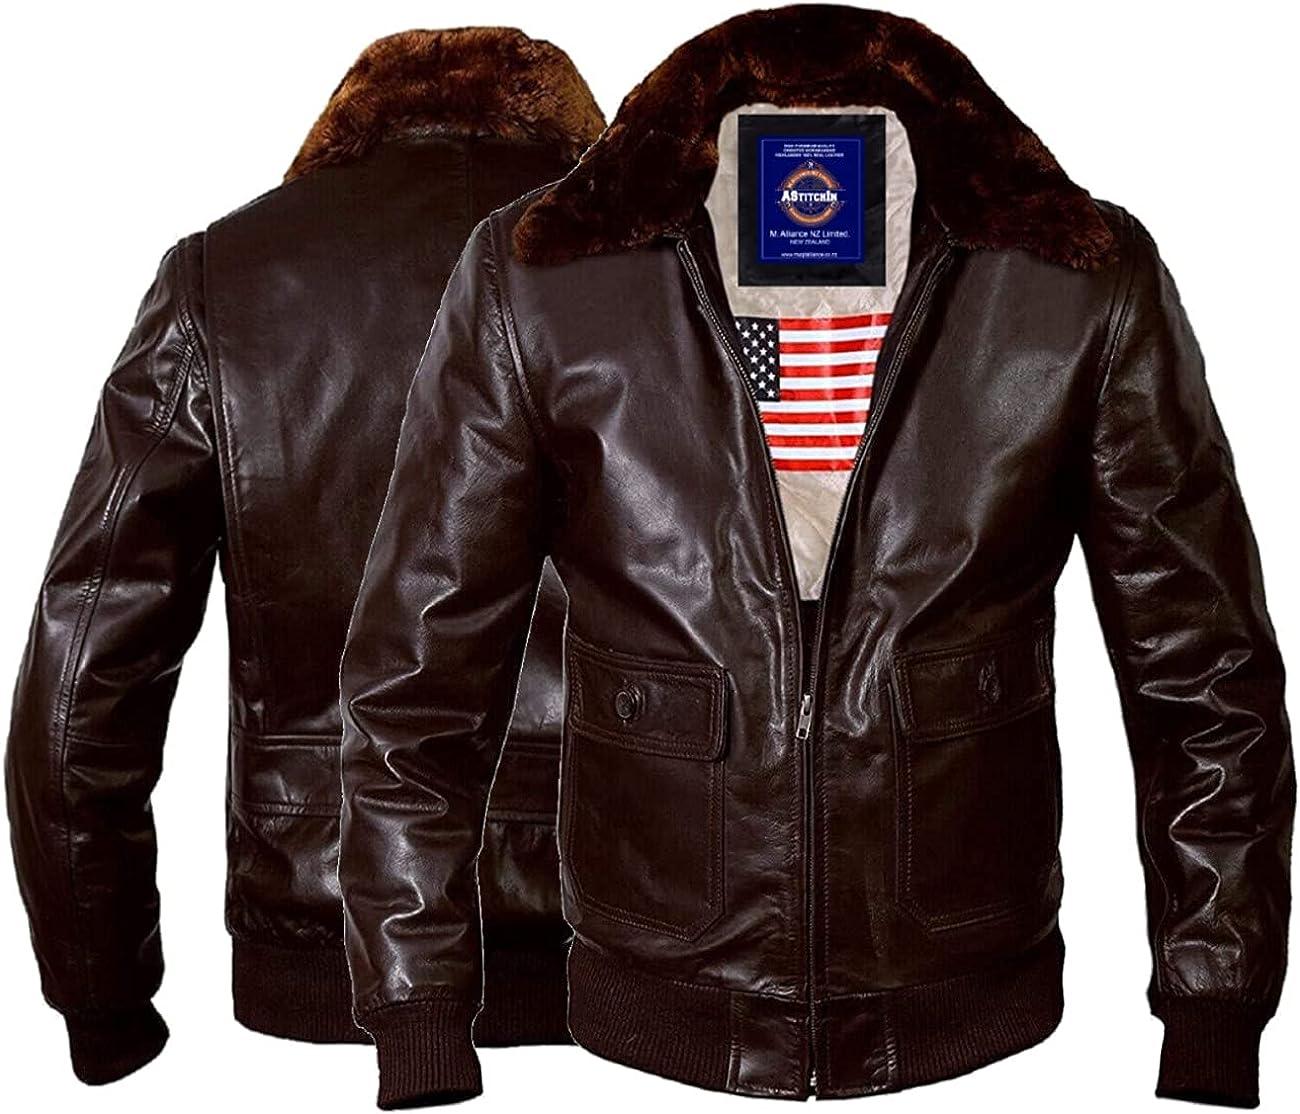 Men's Fashion WWll Navy G1 Fur Collar Flight Bomber Original Lambskin Leather Jacket For Men - AS/NZ-721901006